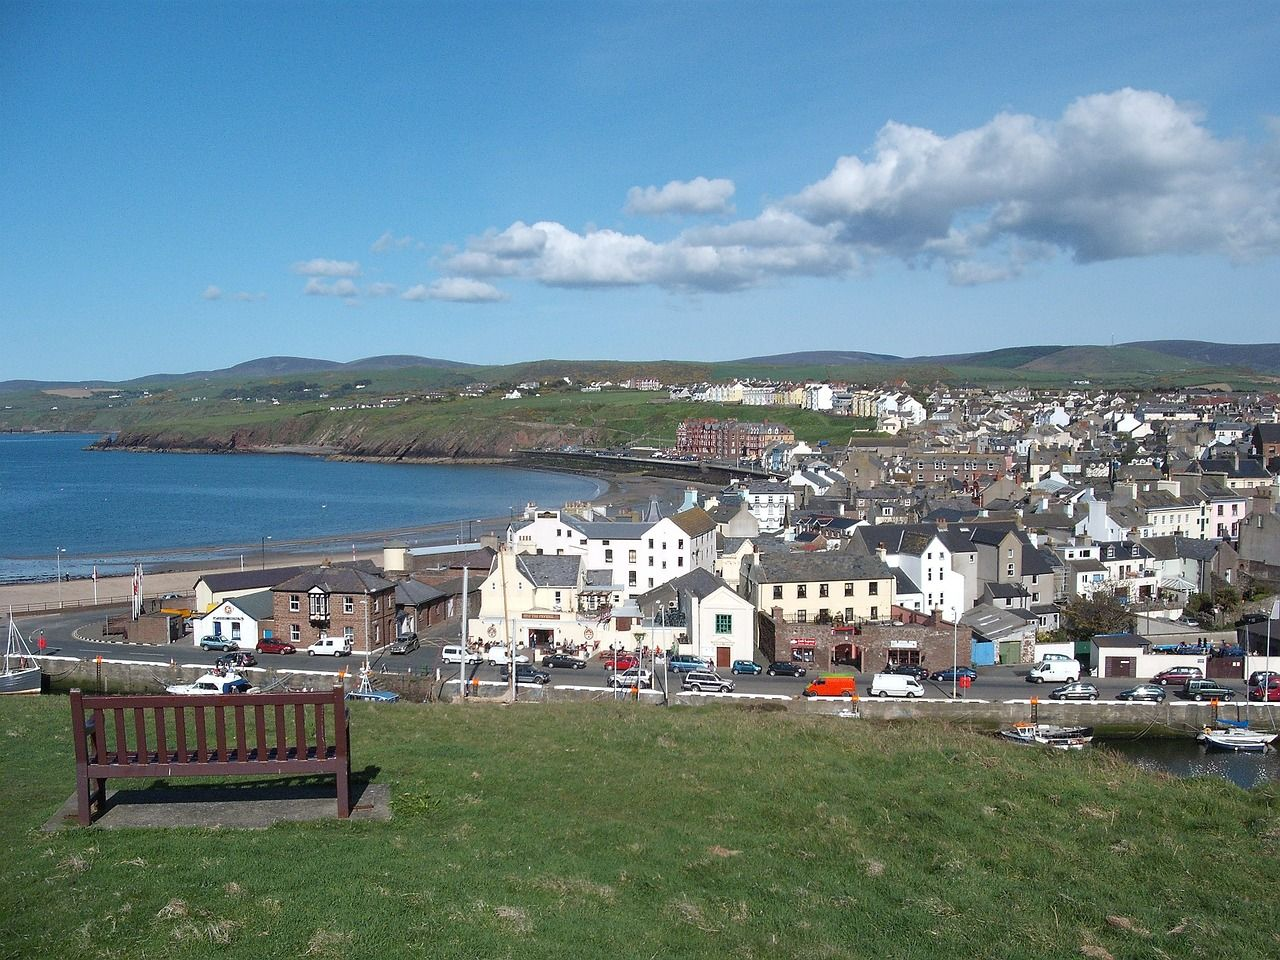 Isle of Man view